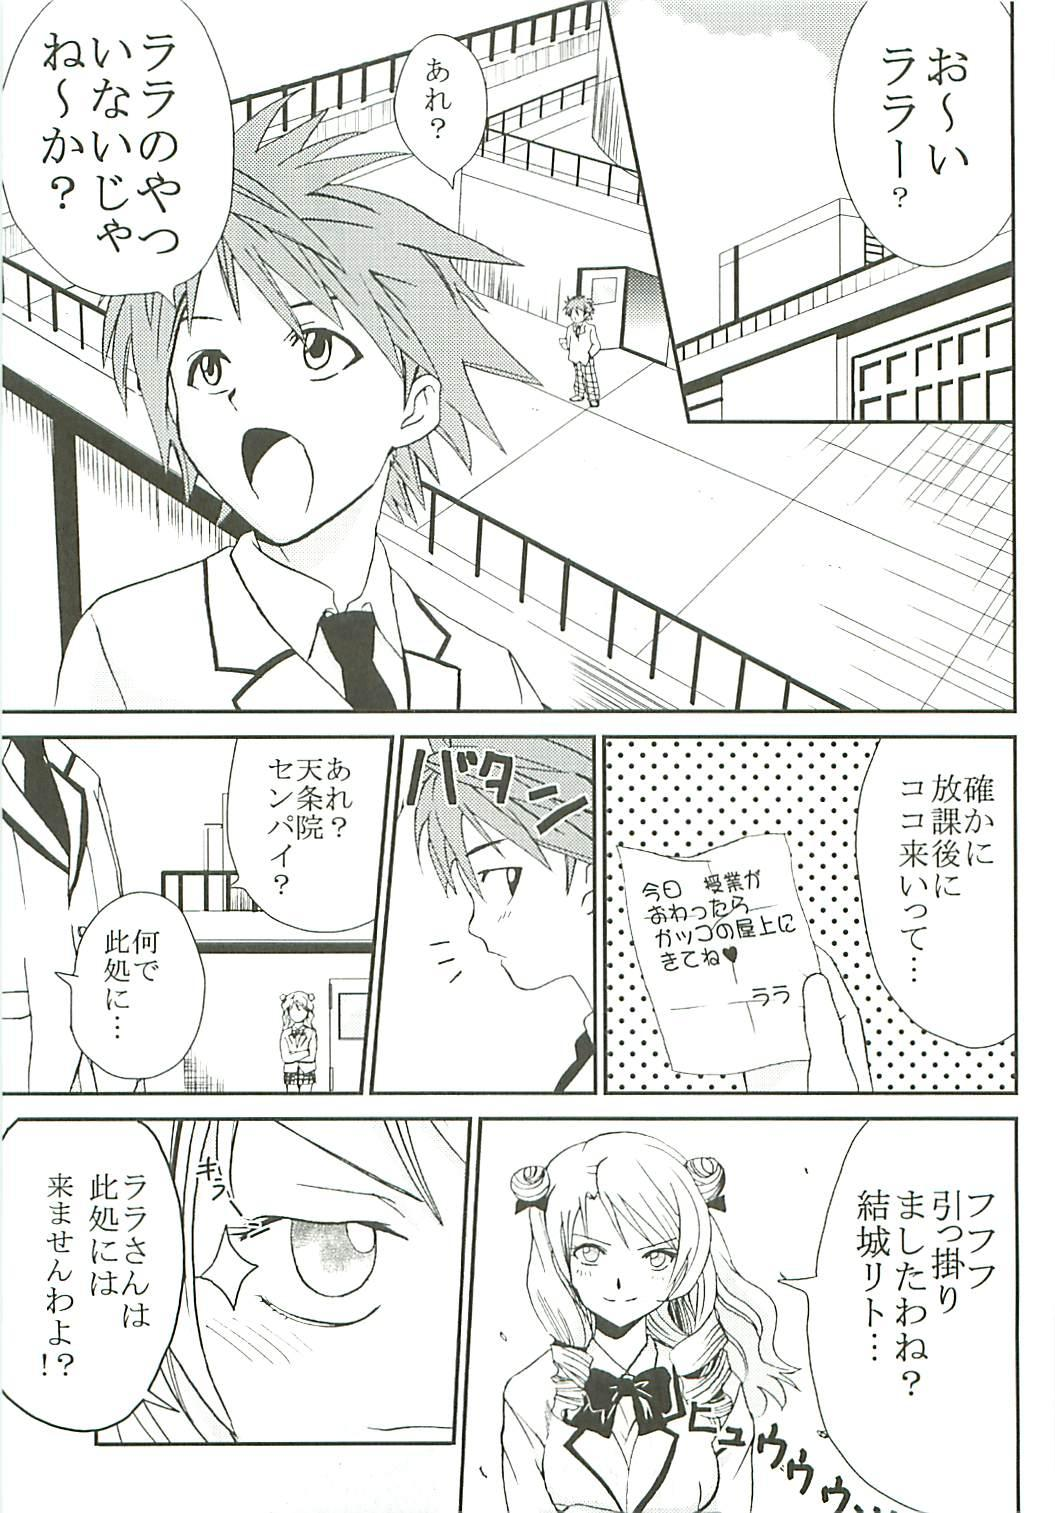 ToLOVE Ryu Vol. 7 33